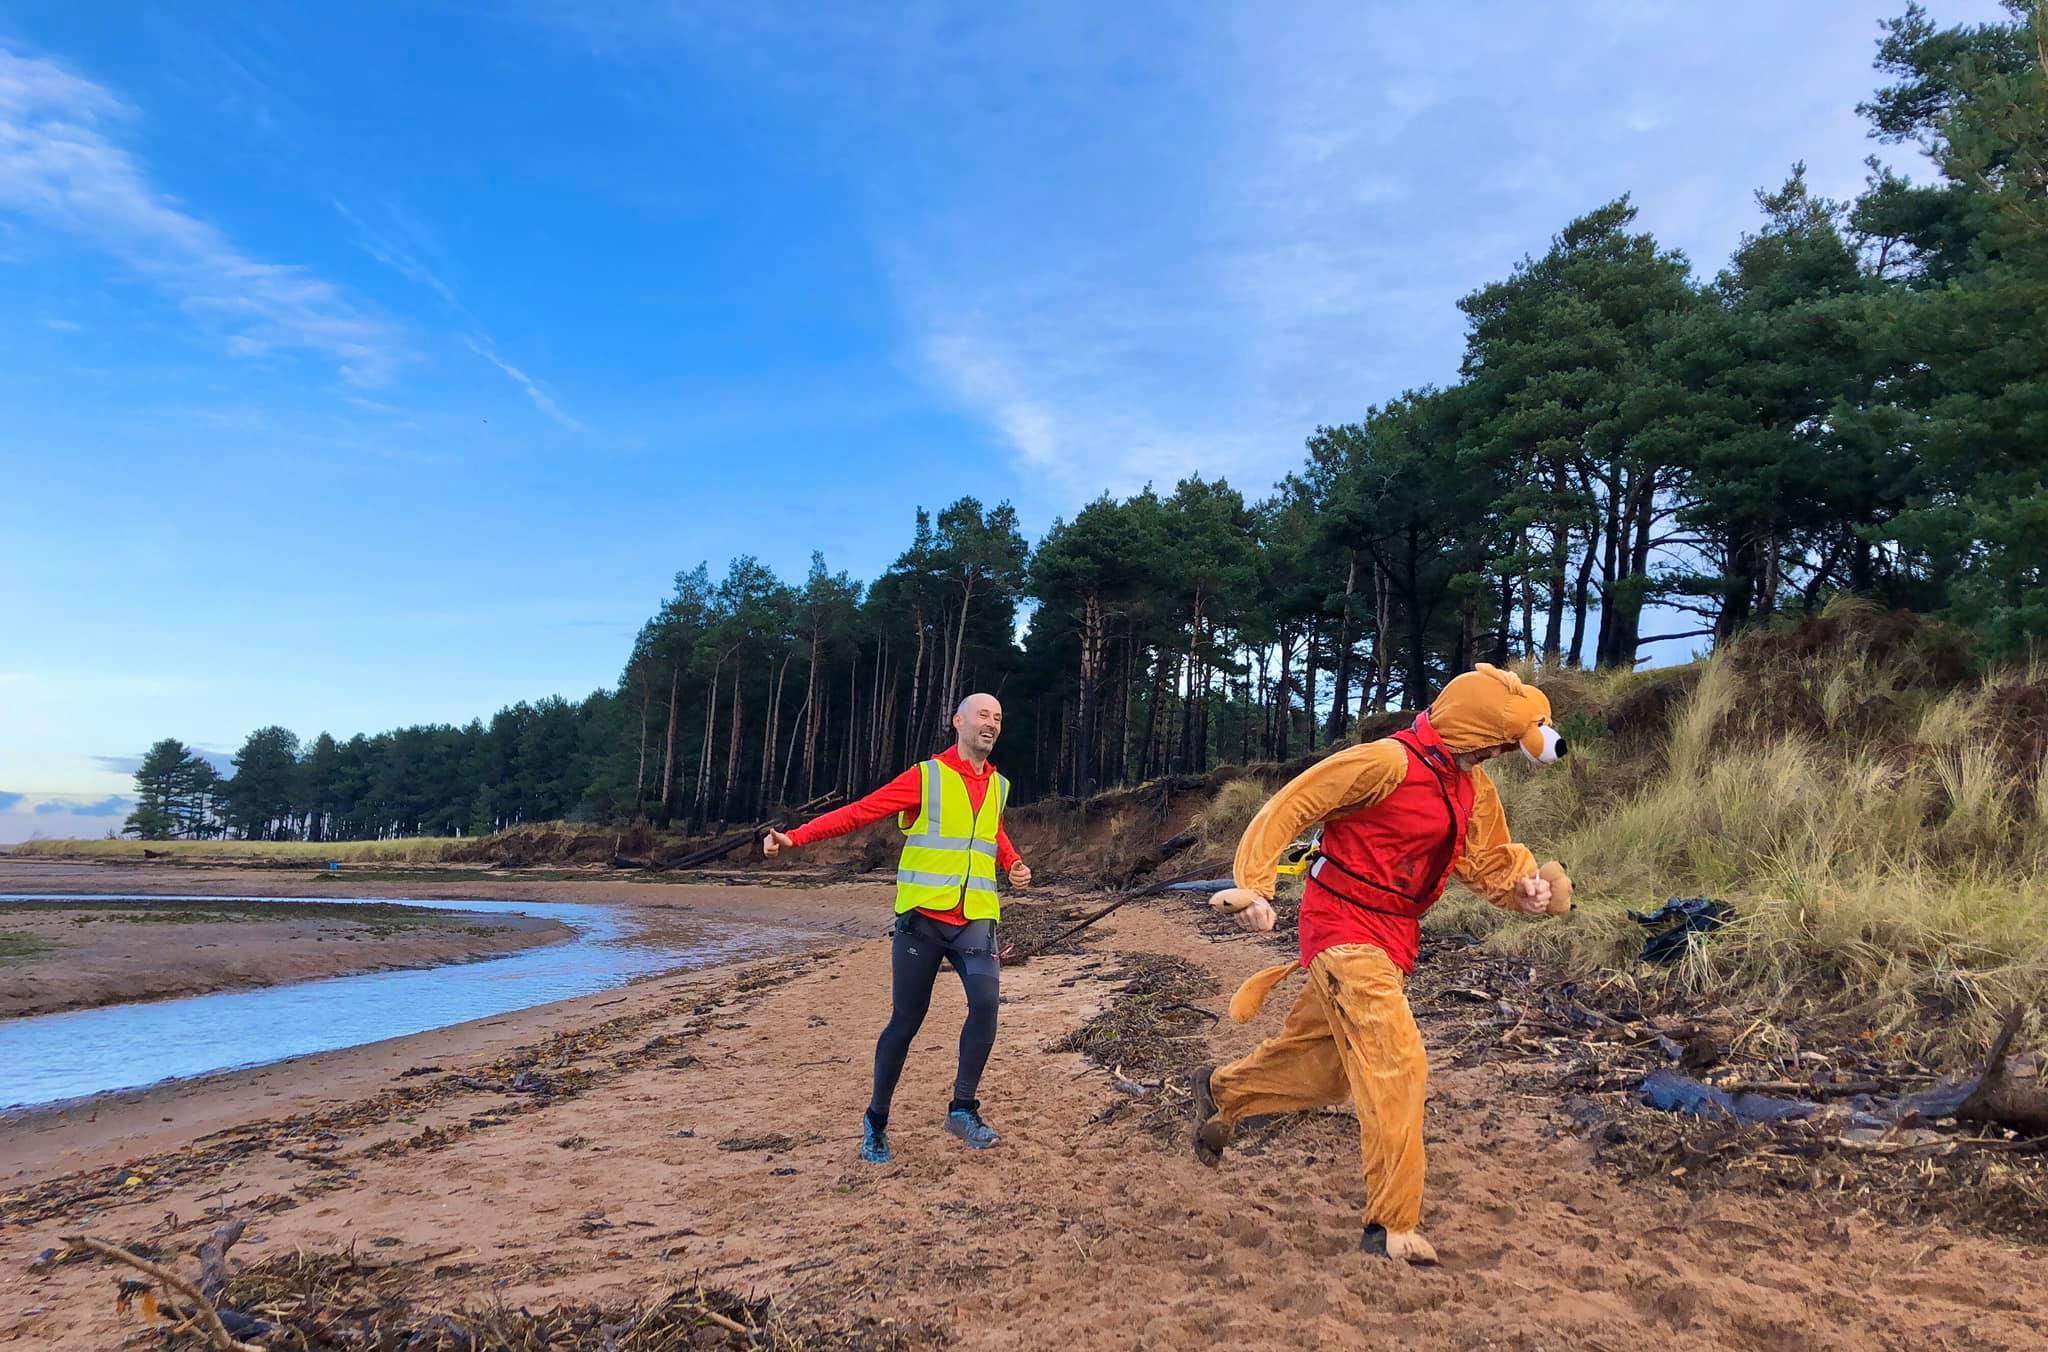 canicross runners on beach